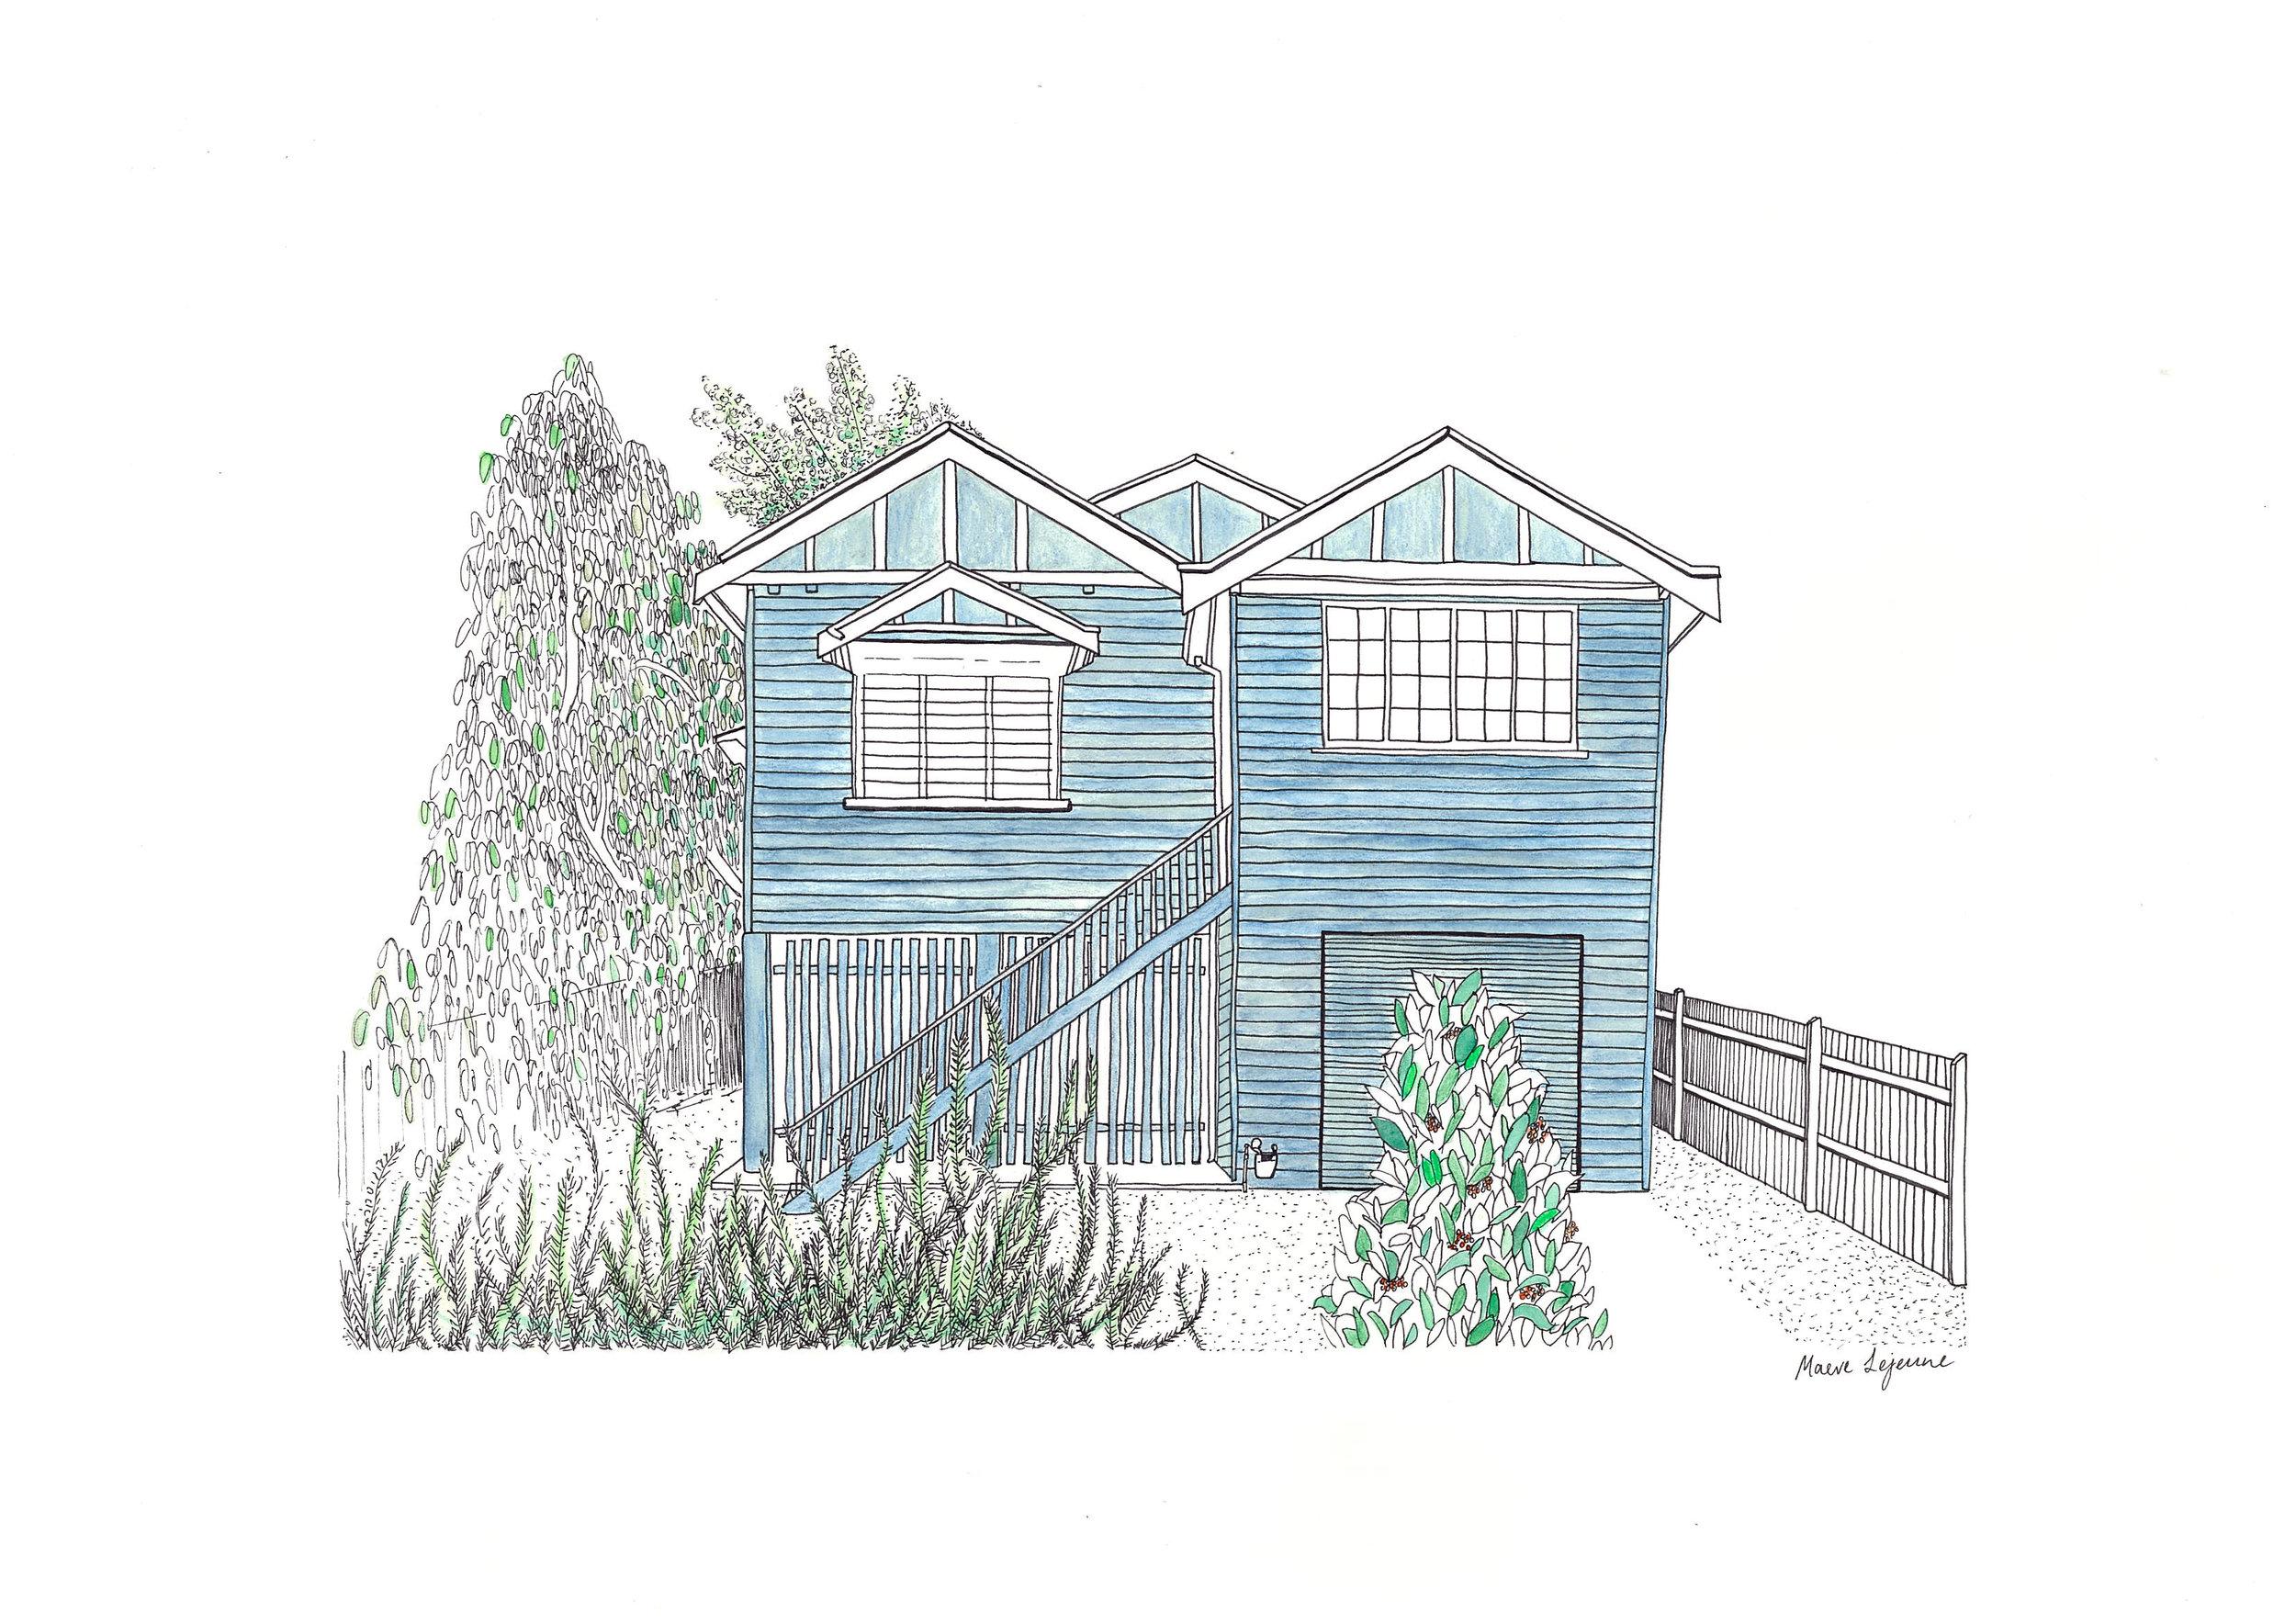 #11 Tori's House